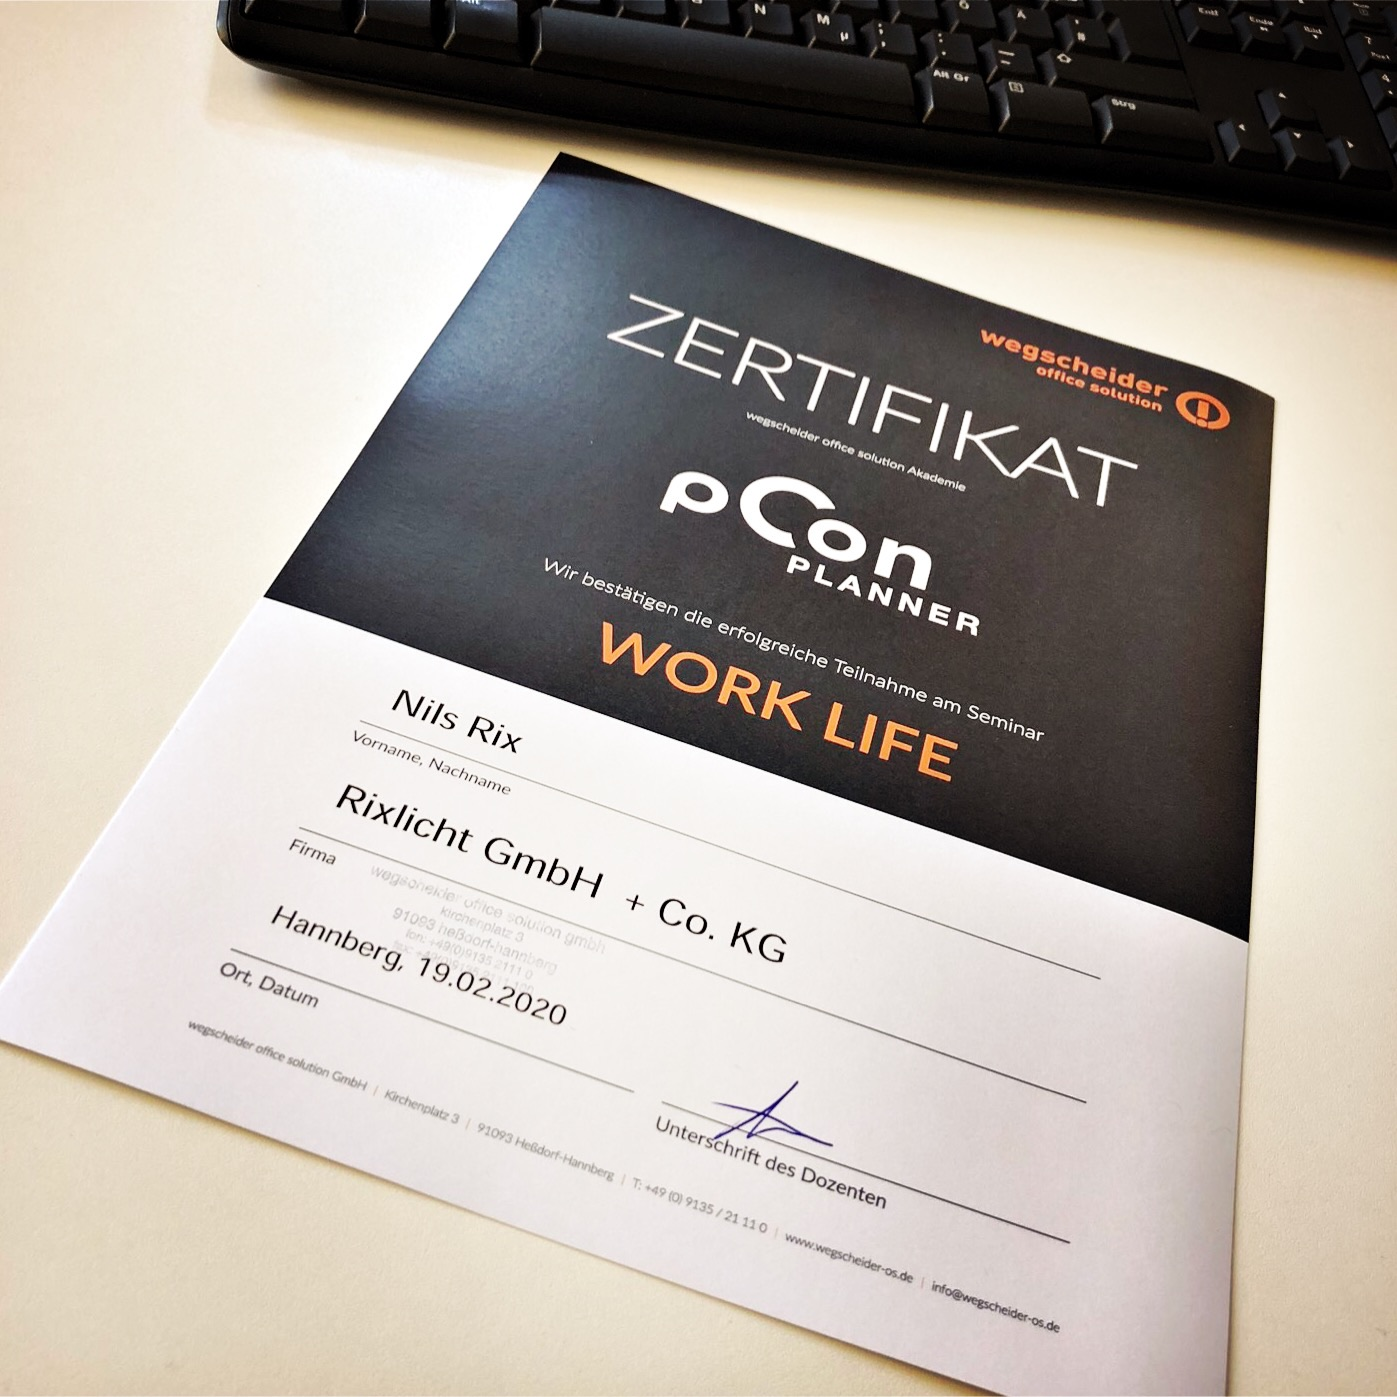 pCon.planner Zertifikat